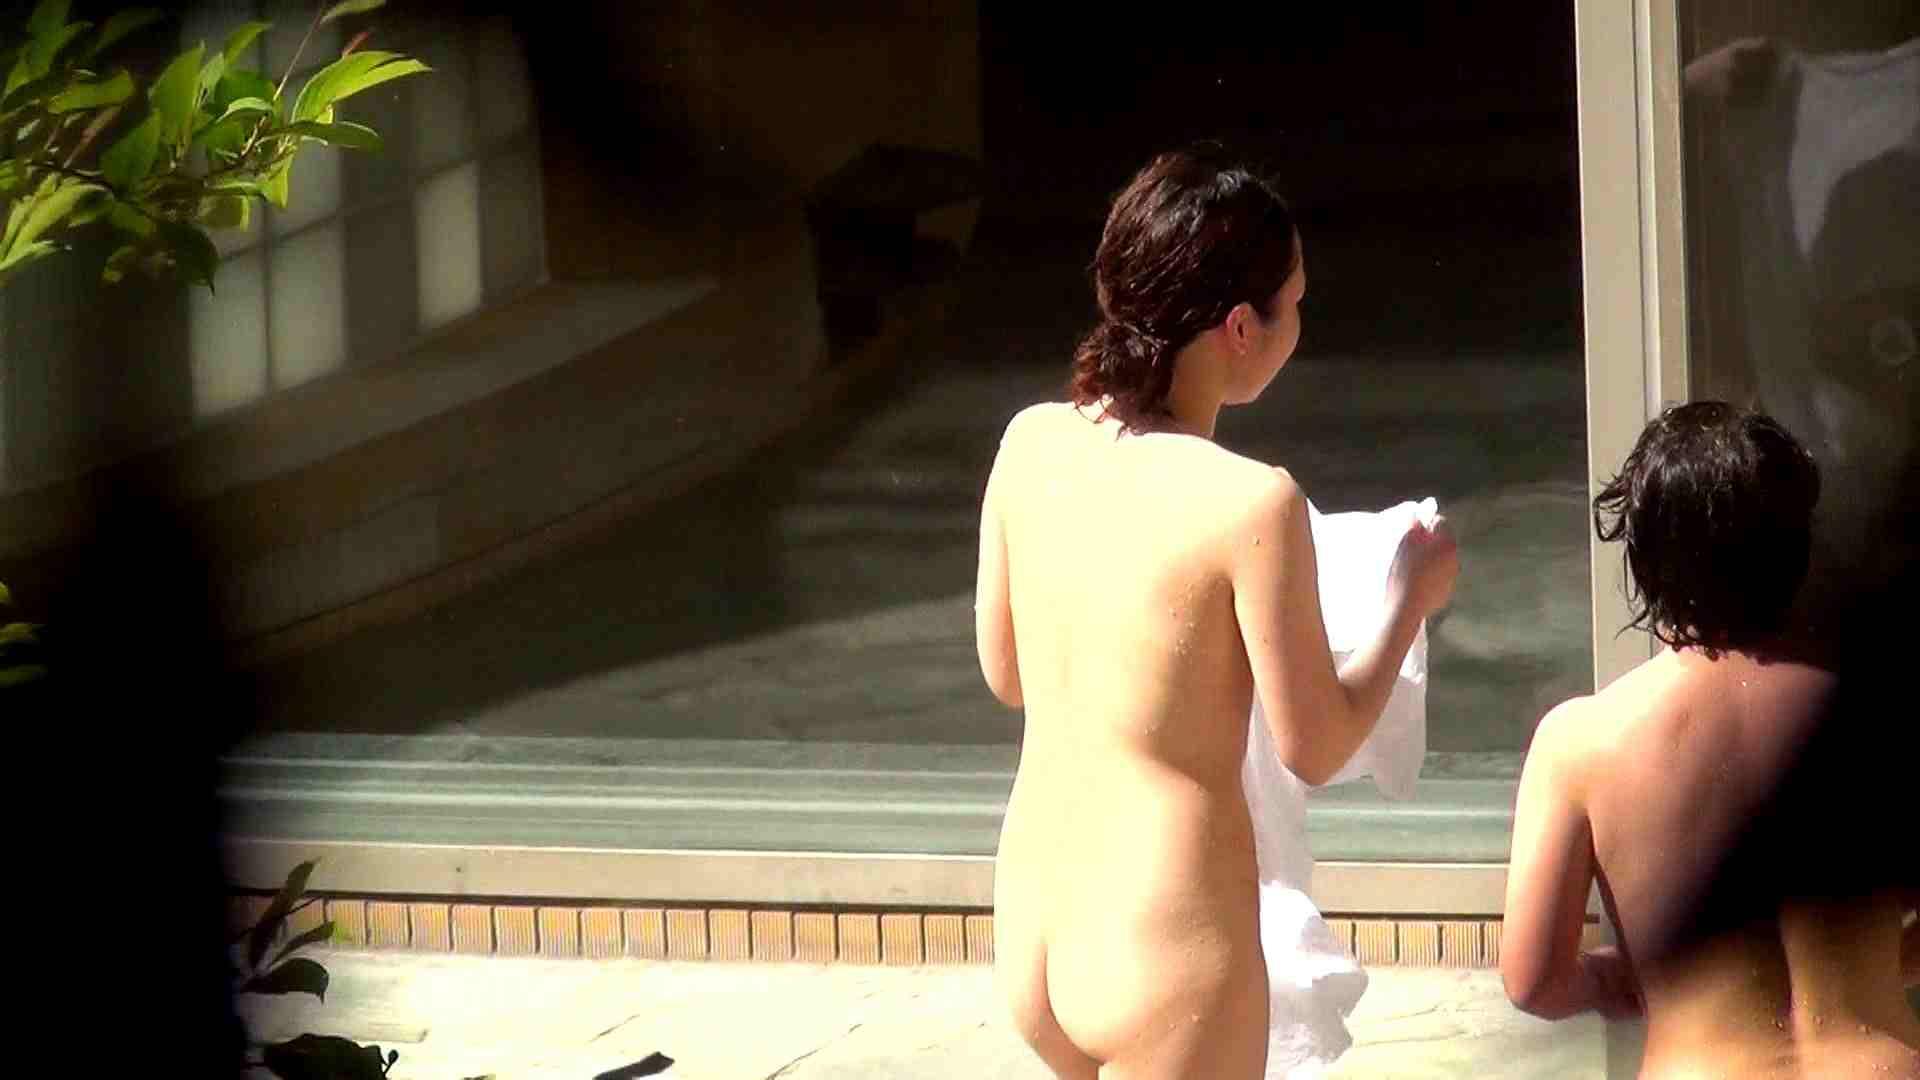 Aquaな露天風呂Vol.268 露天 隠し撮りオマンコ動画紹介 107画像 17